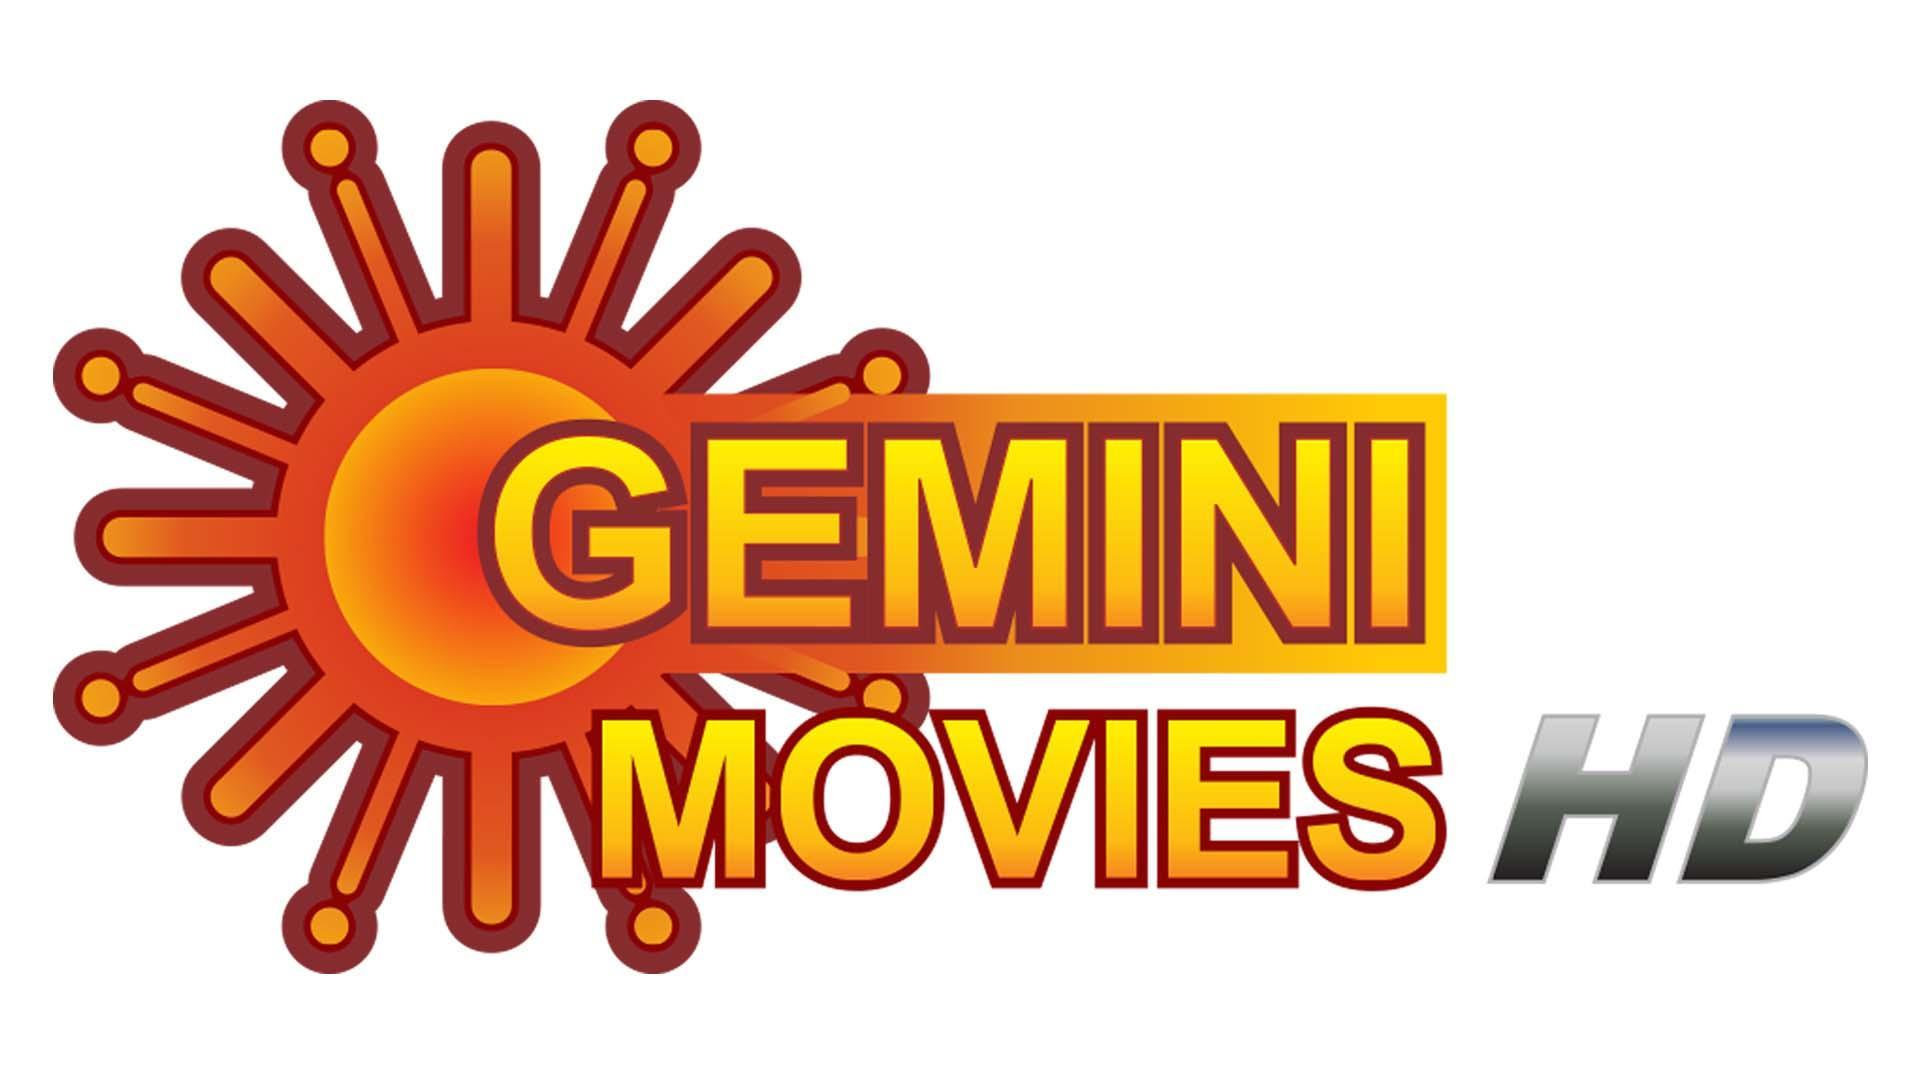 Gemini-Movies-HD.jpg